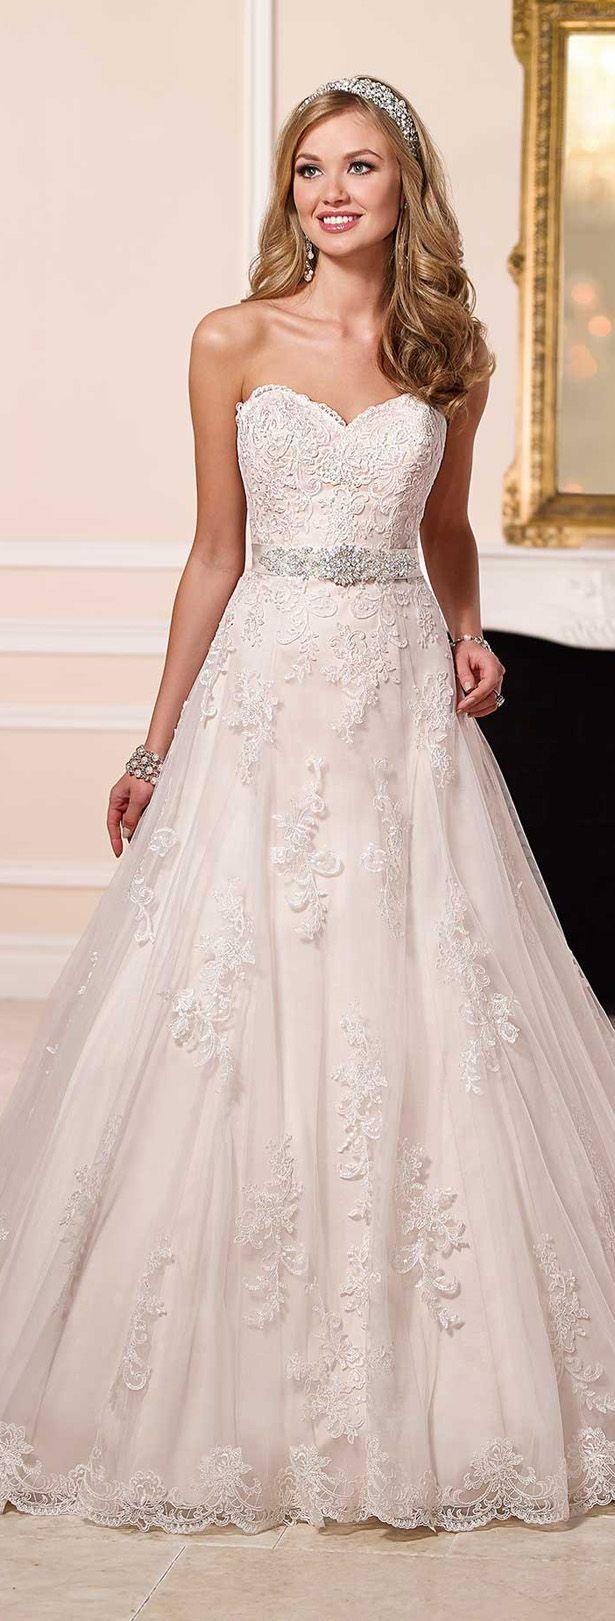 Pulchritudinous wedding dresses simple alexander mcqueen lace